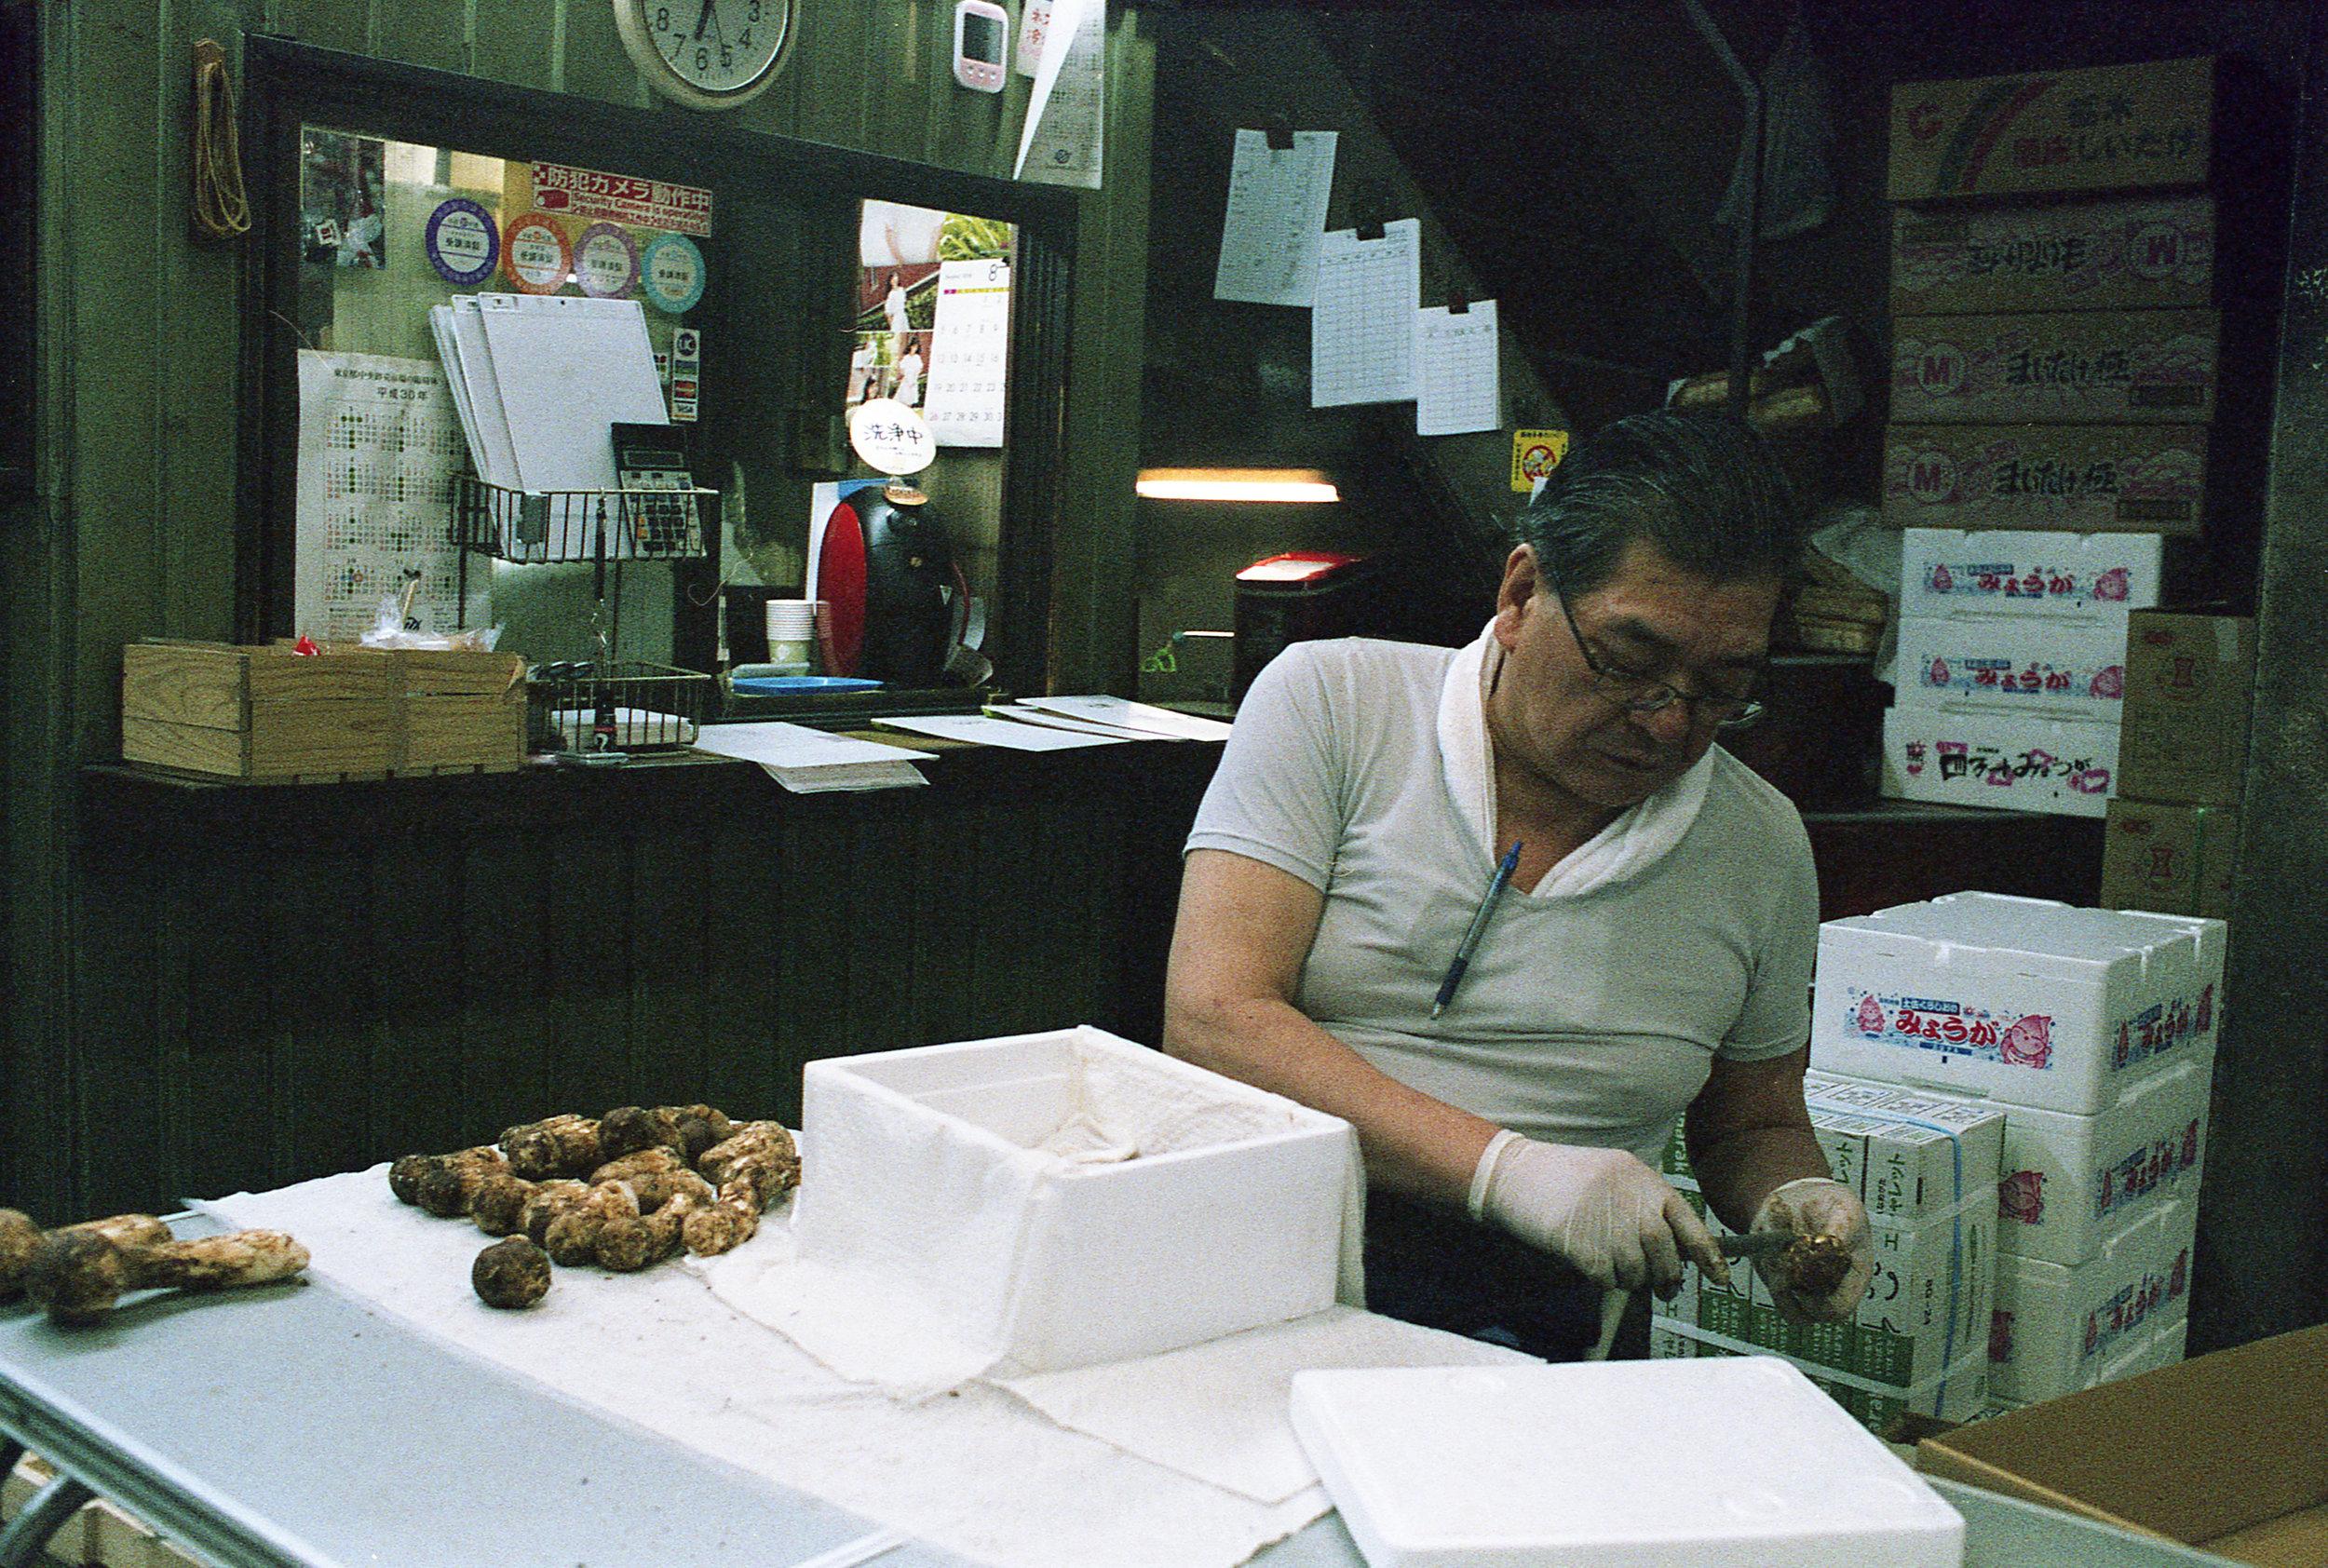 20180830_TsukijiMarket_022s.jpg